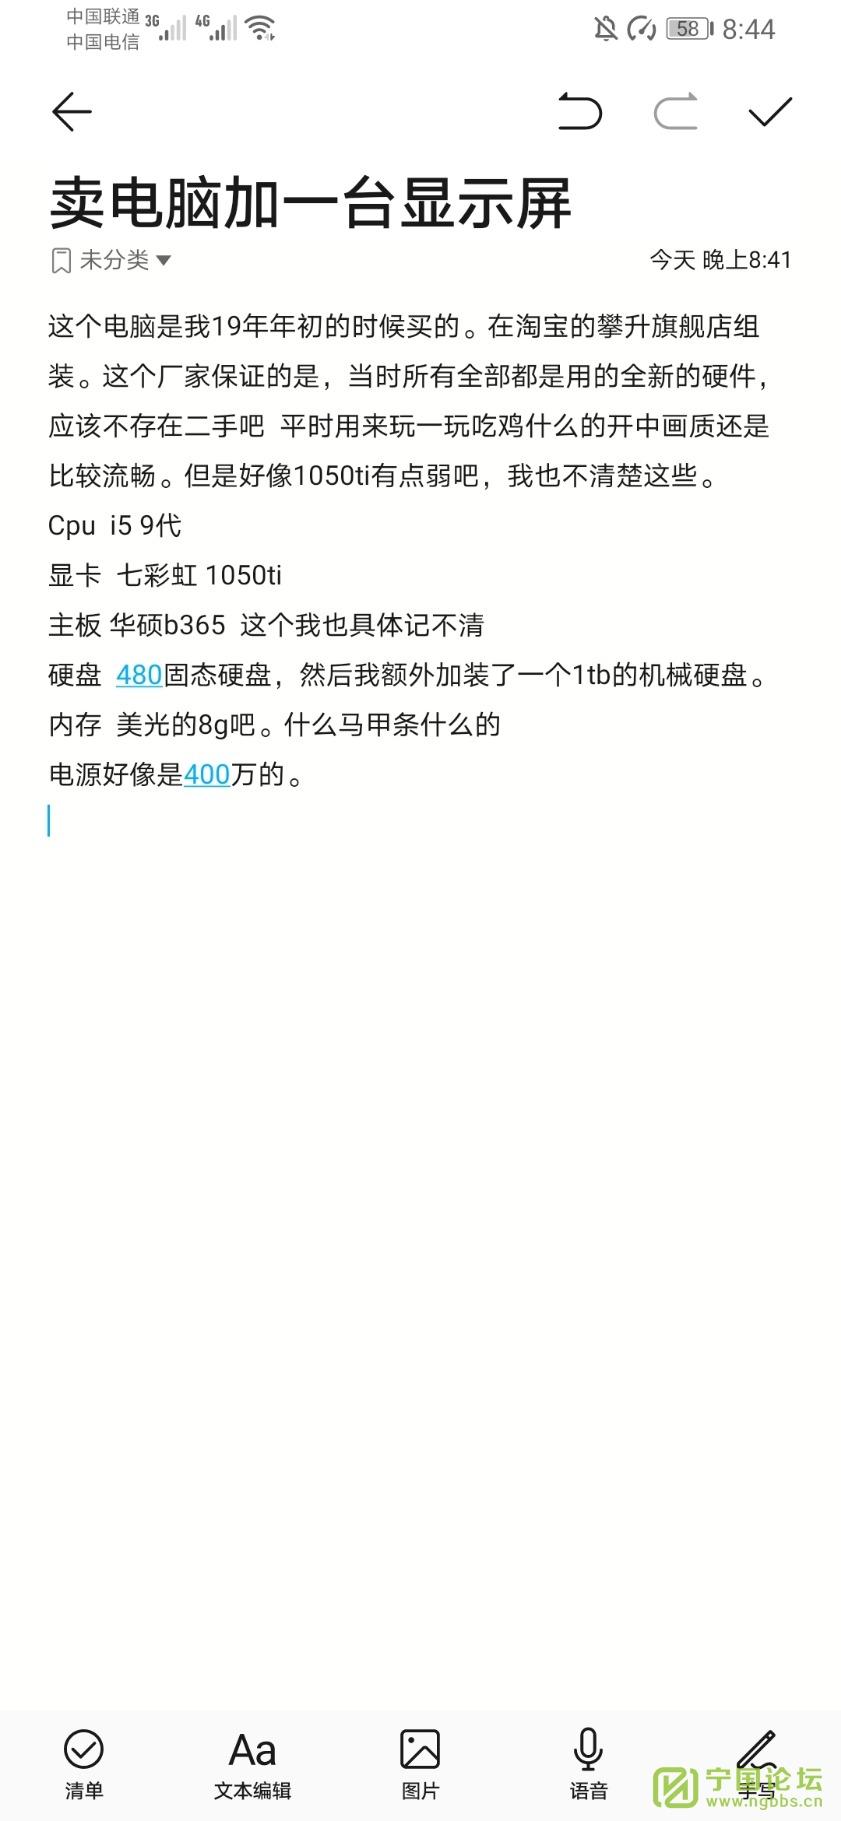 卖电脑和电脑显示屏自己用的。 - 宁国论坛 - Screenshot_20200326_204403_com.example.android.notepad.jpg